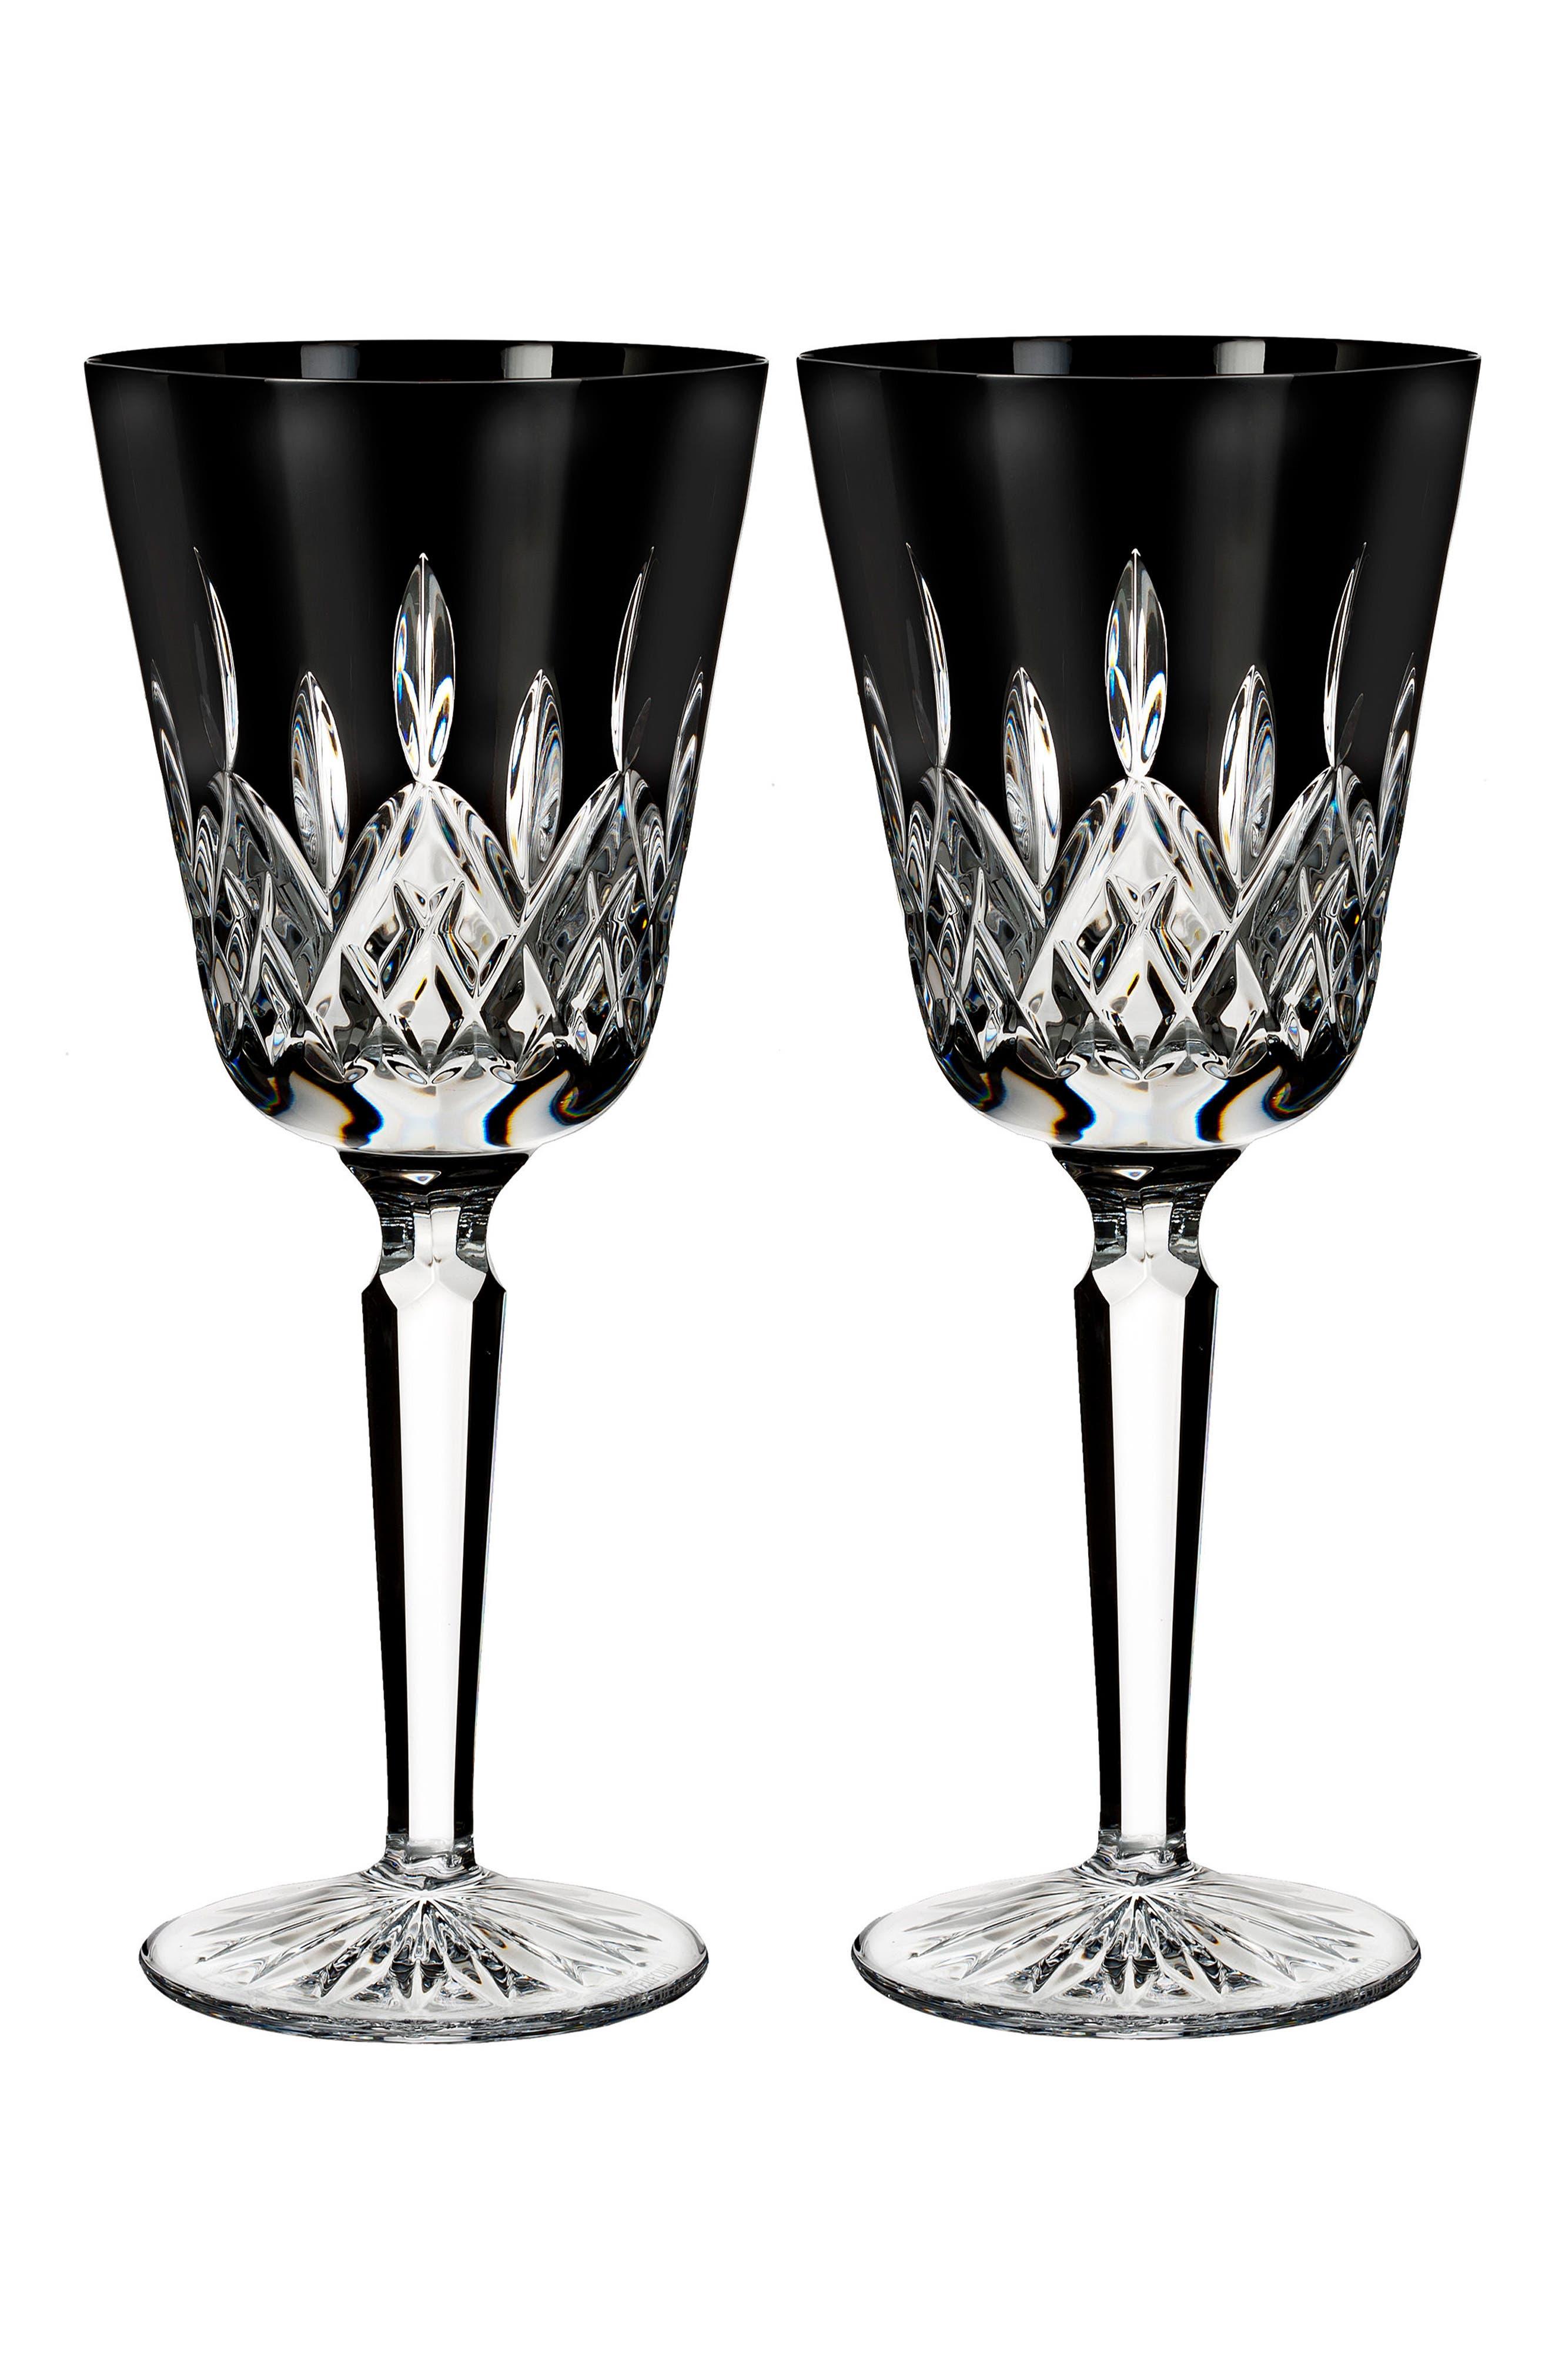 Waterford Lismore Diamond Set of 2 Black Lead Crystal Goblets